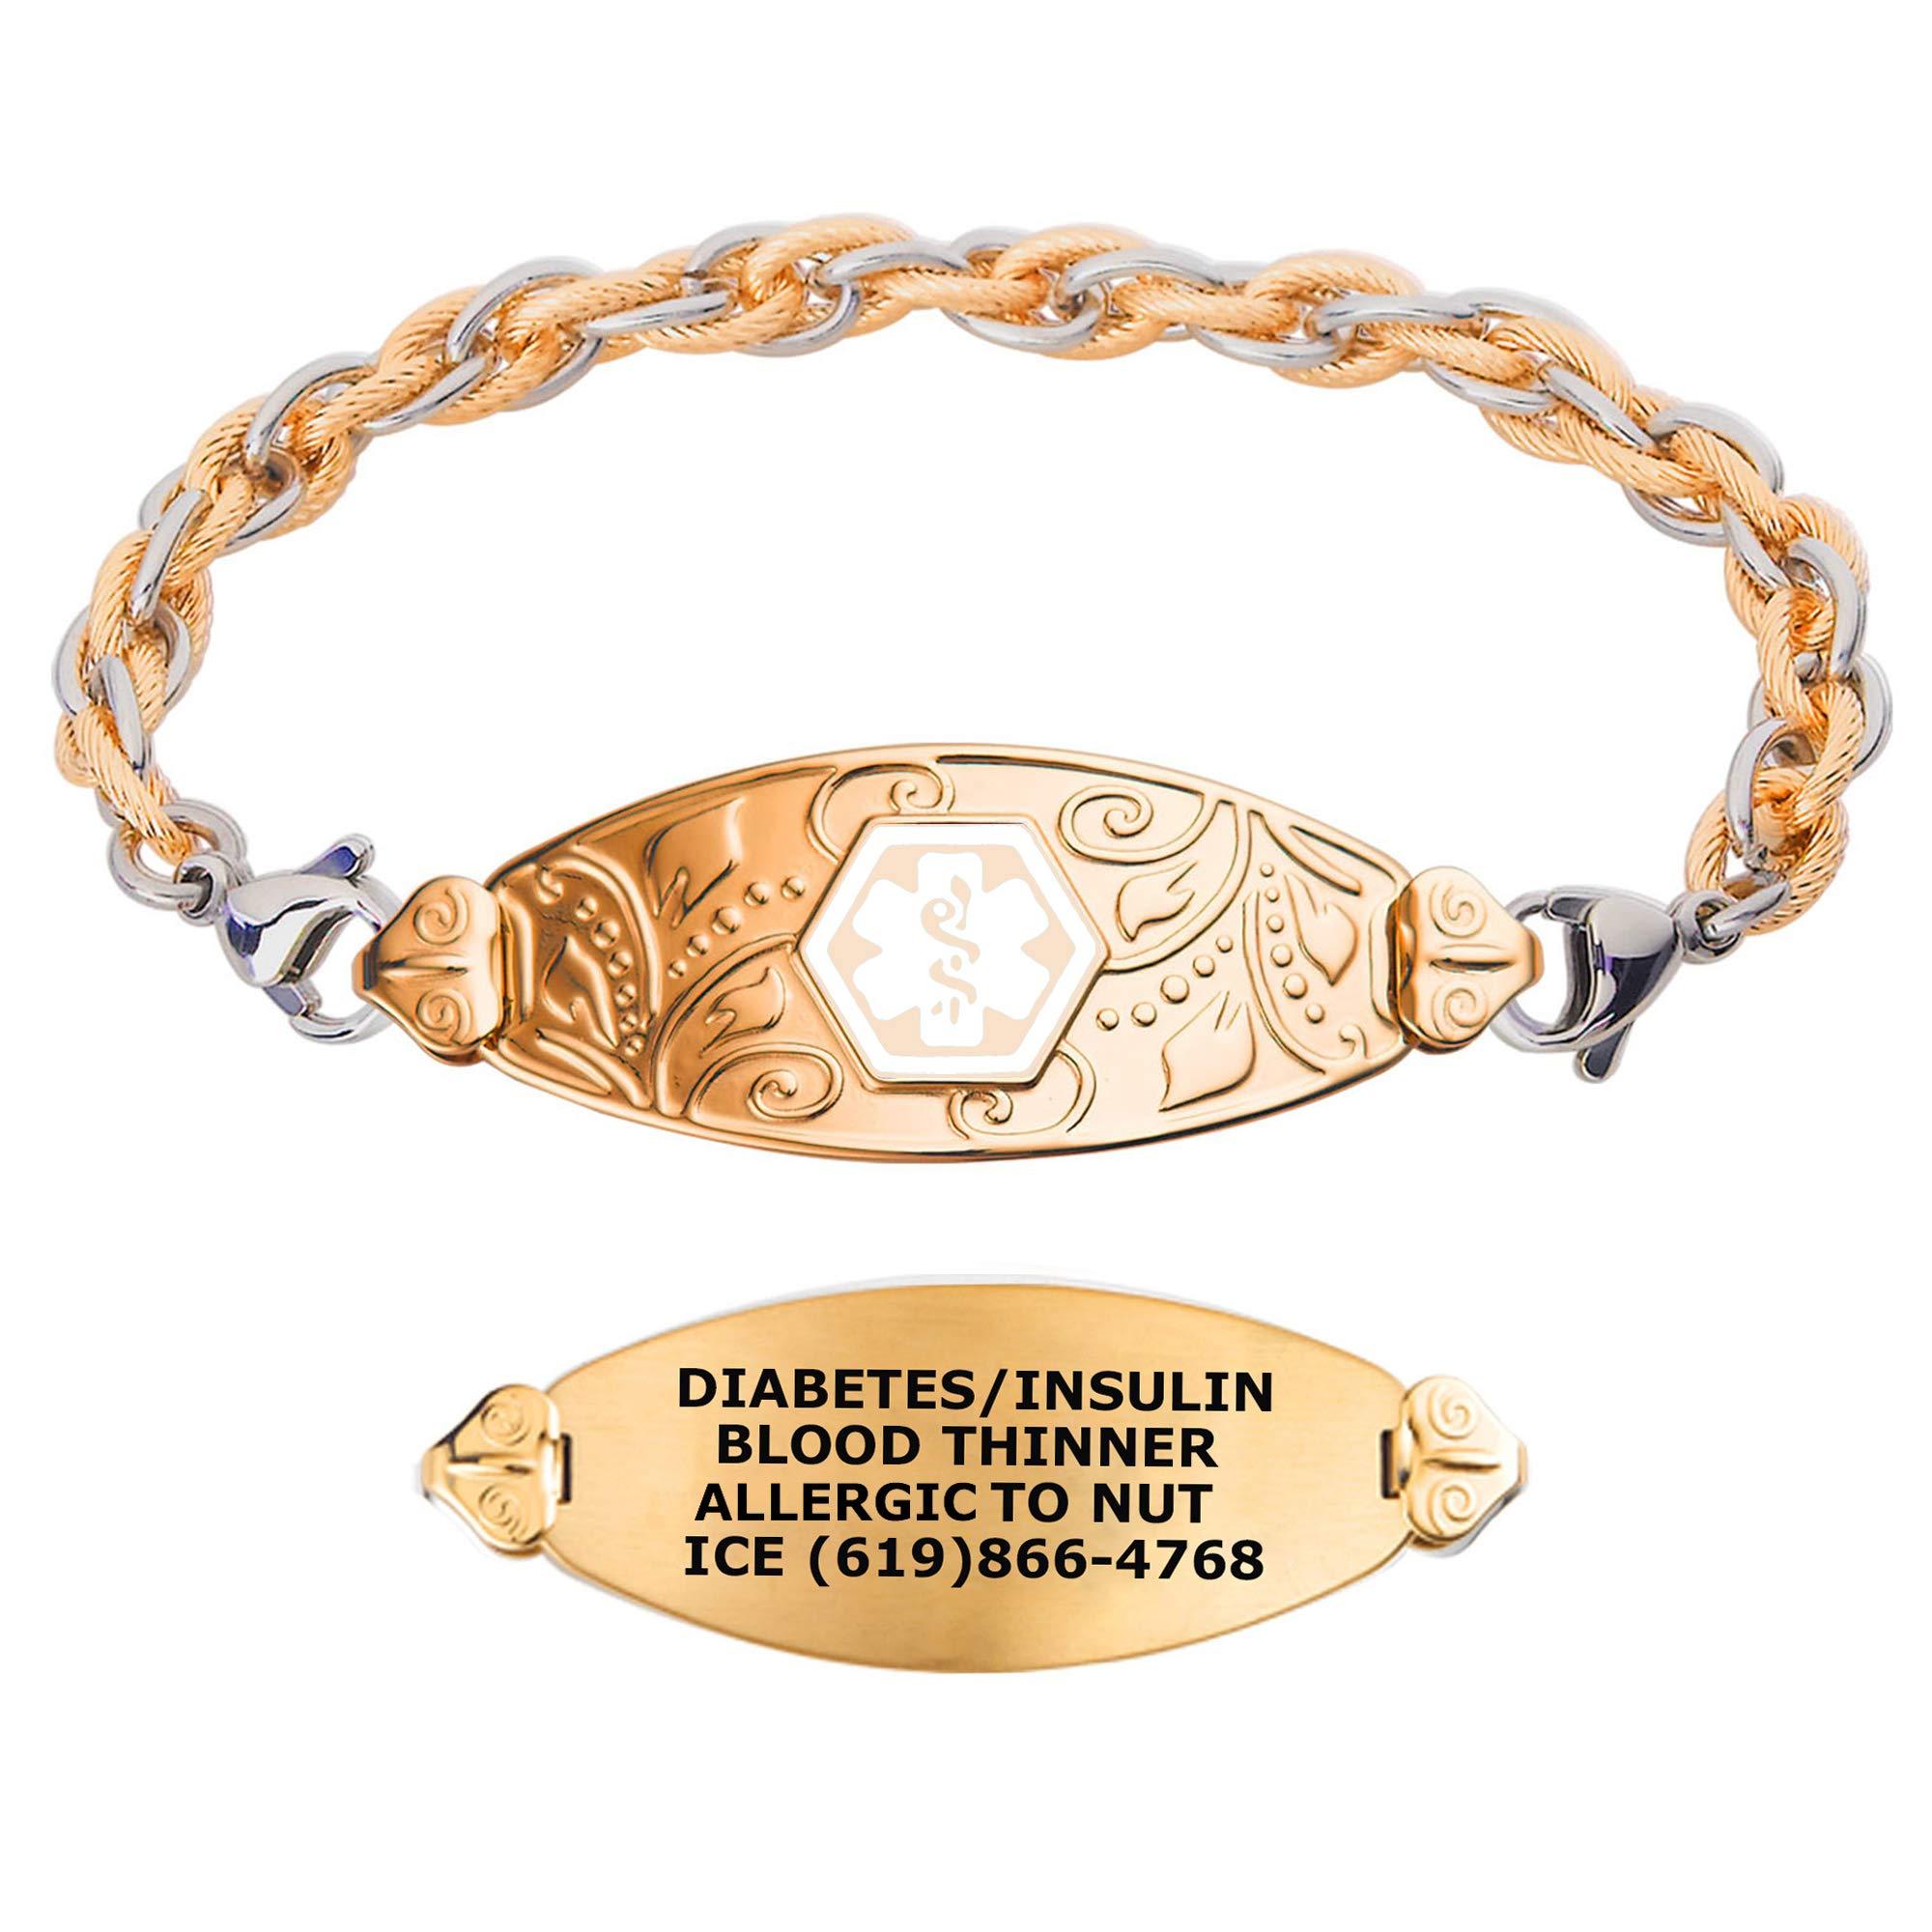 Divoti Custom Engraved Medical Alert Bracelets for Women, Stainless Steel Medical Bracelet, Medical ID Bracelet w/Free Engraving - PVD Gold Lovely Filigree Tag w/Inter-Mesh Gold/Silver-White-8.0'' by Divoti